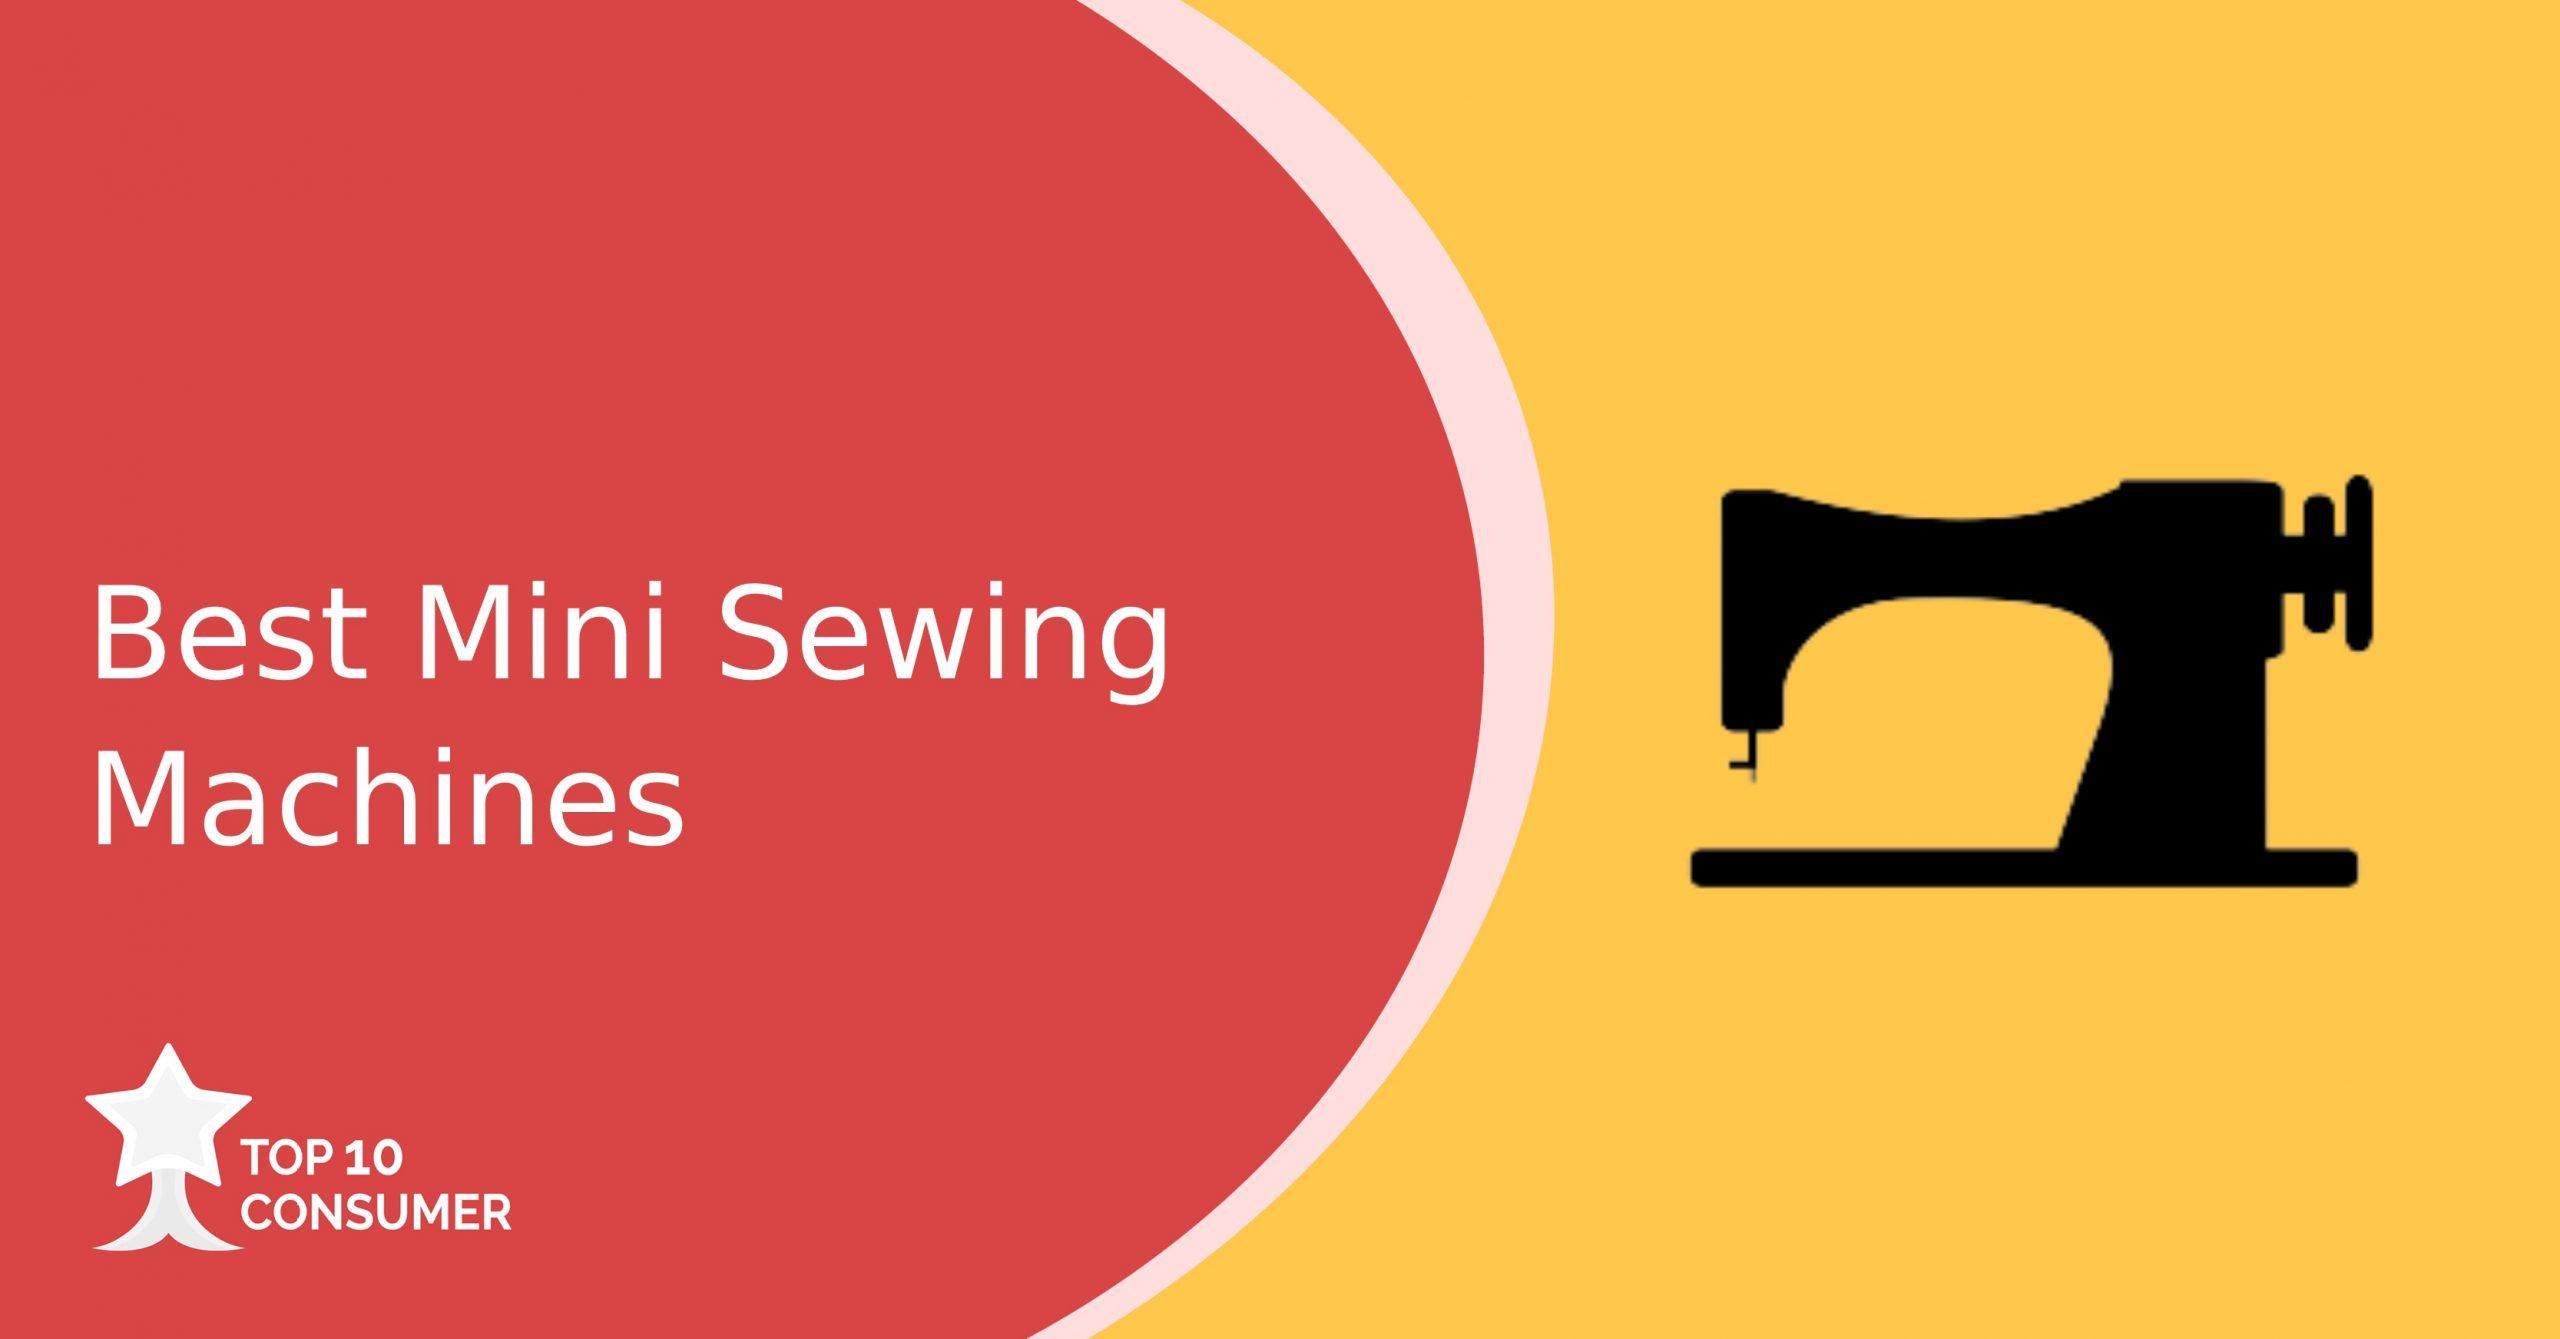 Best Mini Sewing Machines